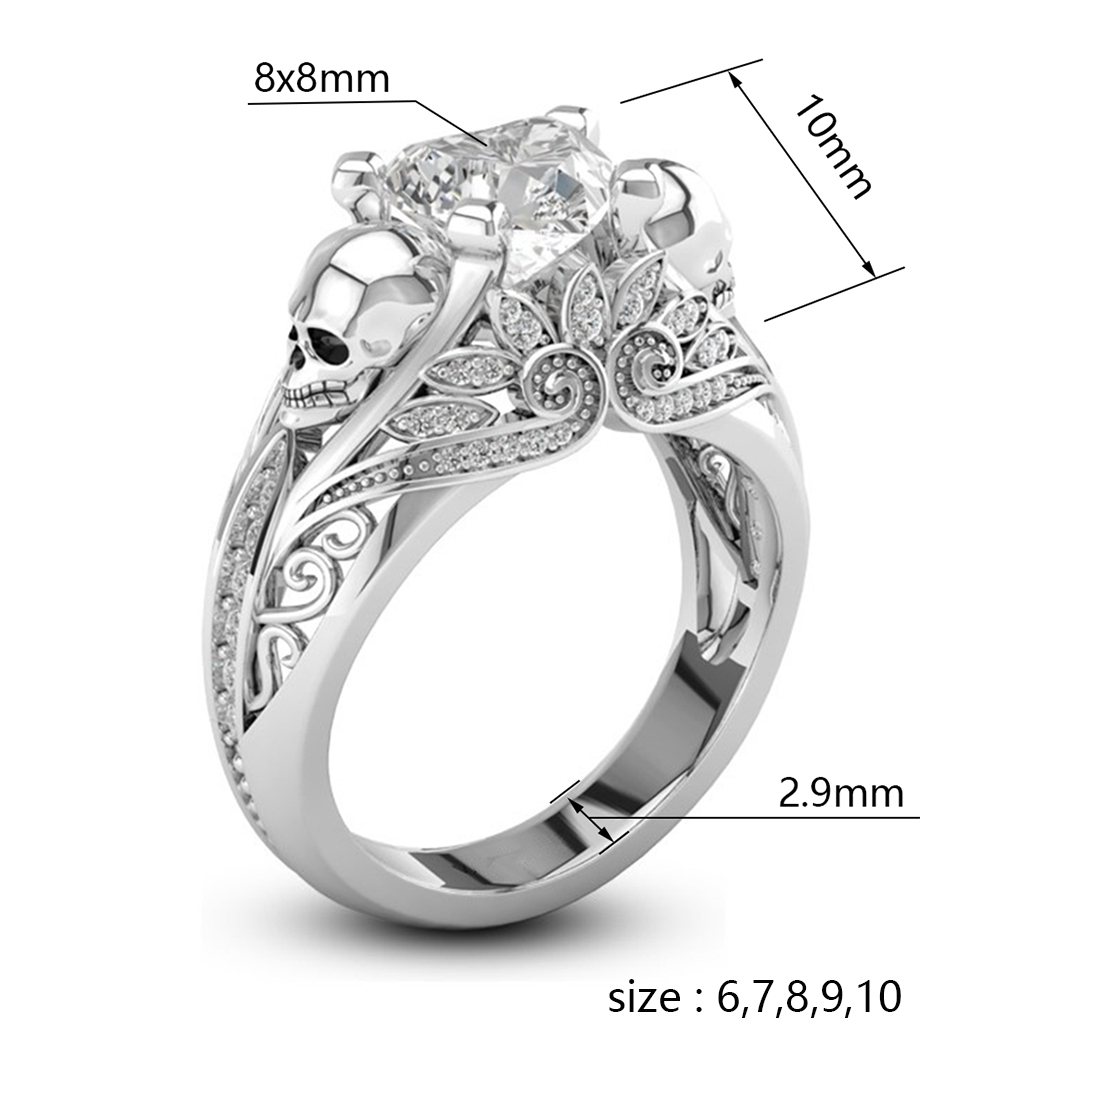 Vancaro Heart Cut Ruby Two Tone 925 Silver Skull Ring Sterling Weeding: Vancaro Wedding Bands Skulls At Websimilar.org